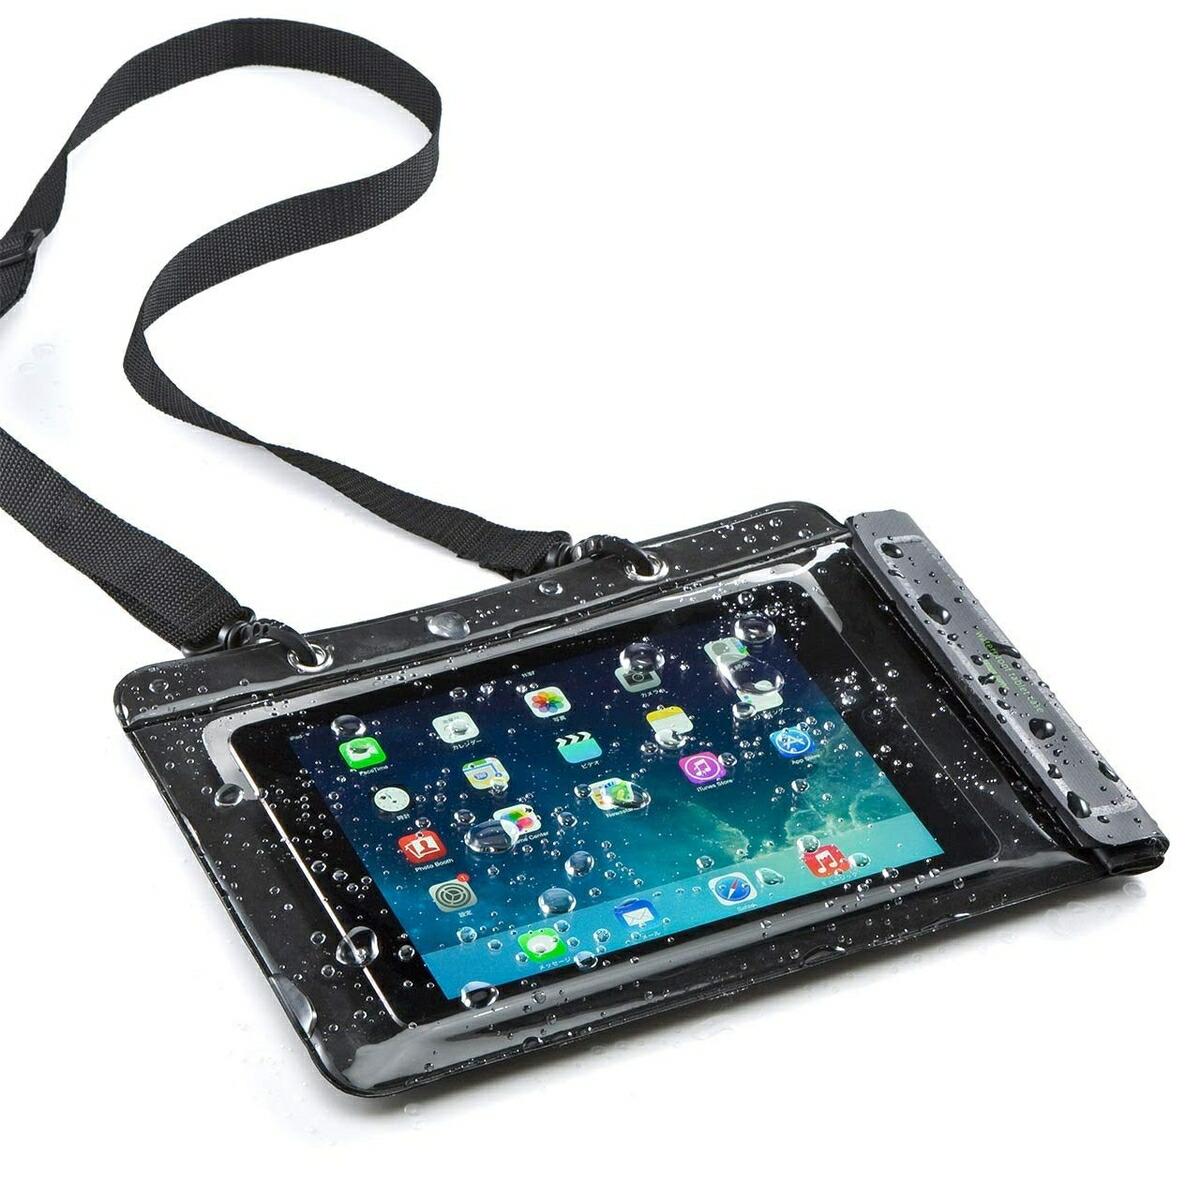 200-PDA127 サンワダイレクト限定品 iPad タブレット 防水ケース Air 送料無料 10.5インチ対応 スタンド機能付 水中撮影 プール お風呂に 新入荷 流行 防水カバー 海 汎用ケース